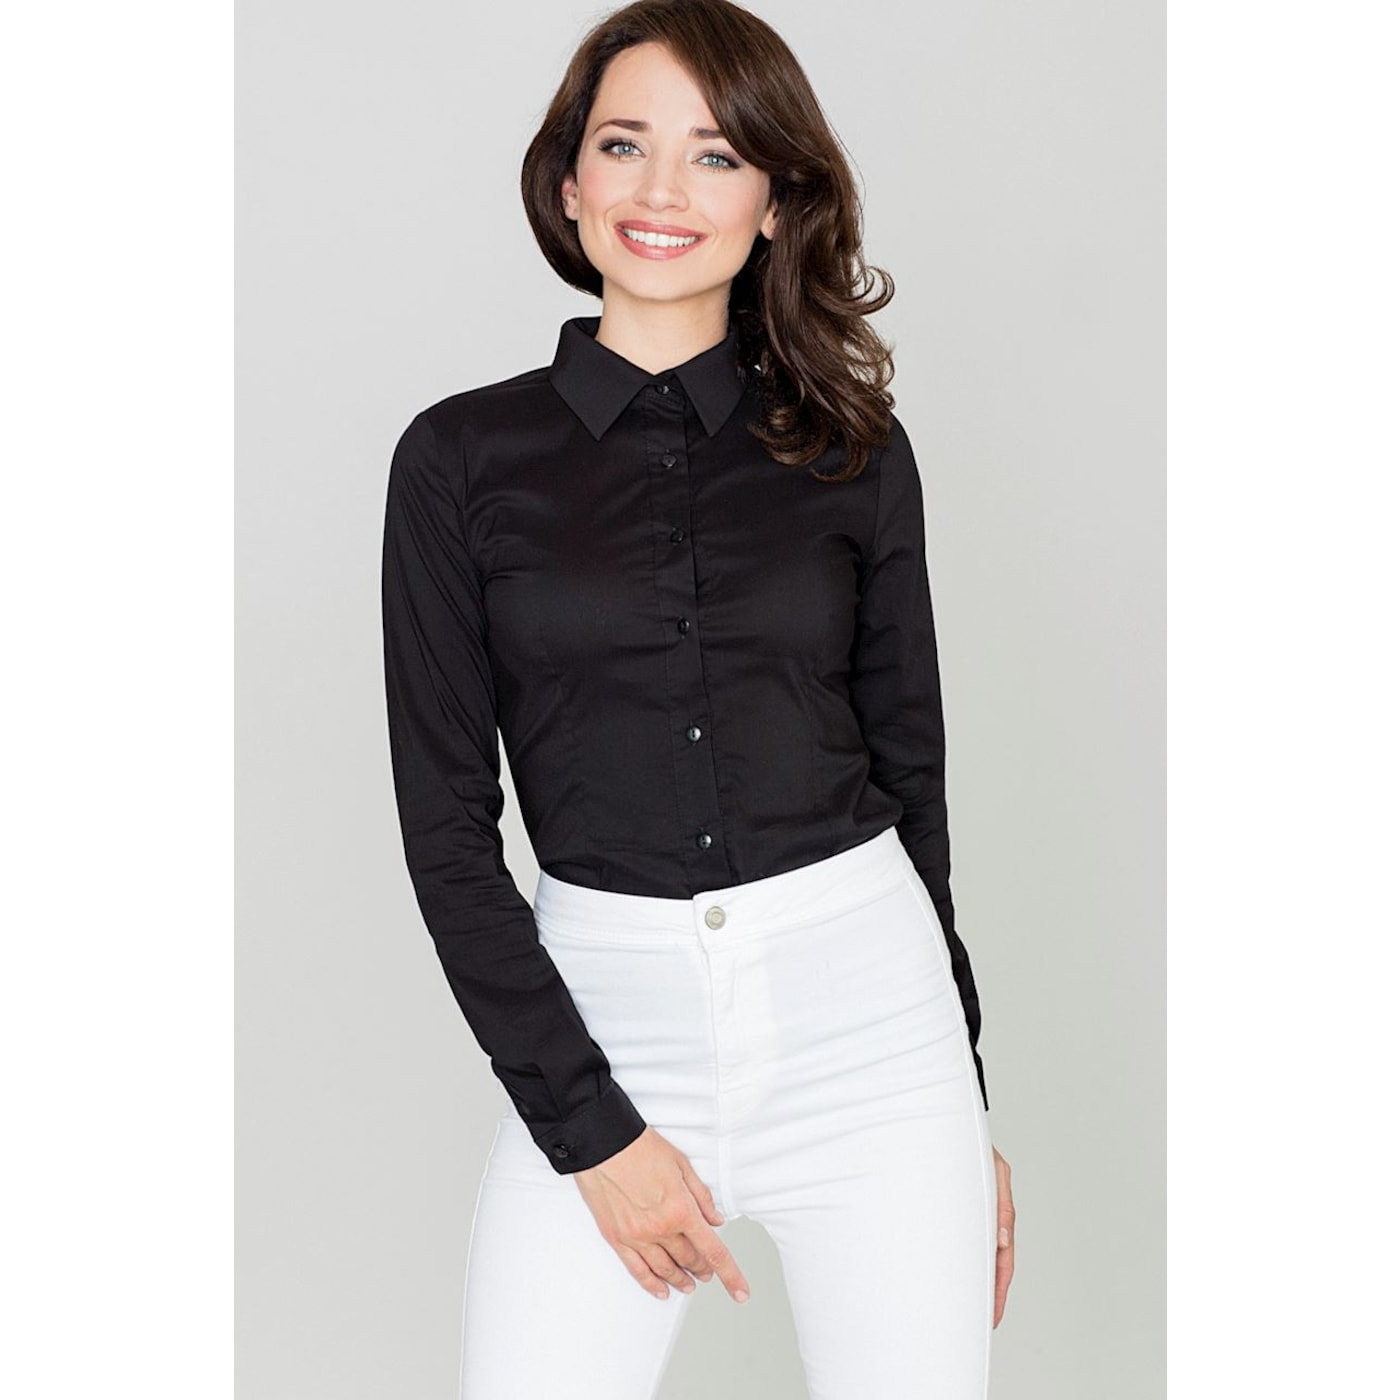 Katrus Womans Shirt K240 dámské Black M